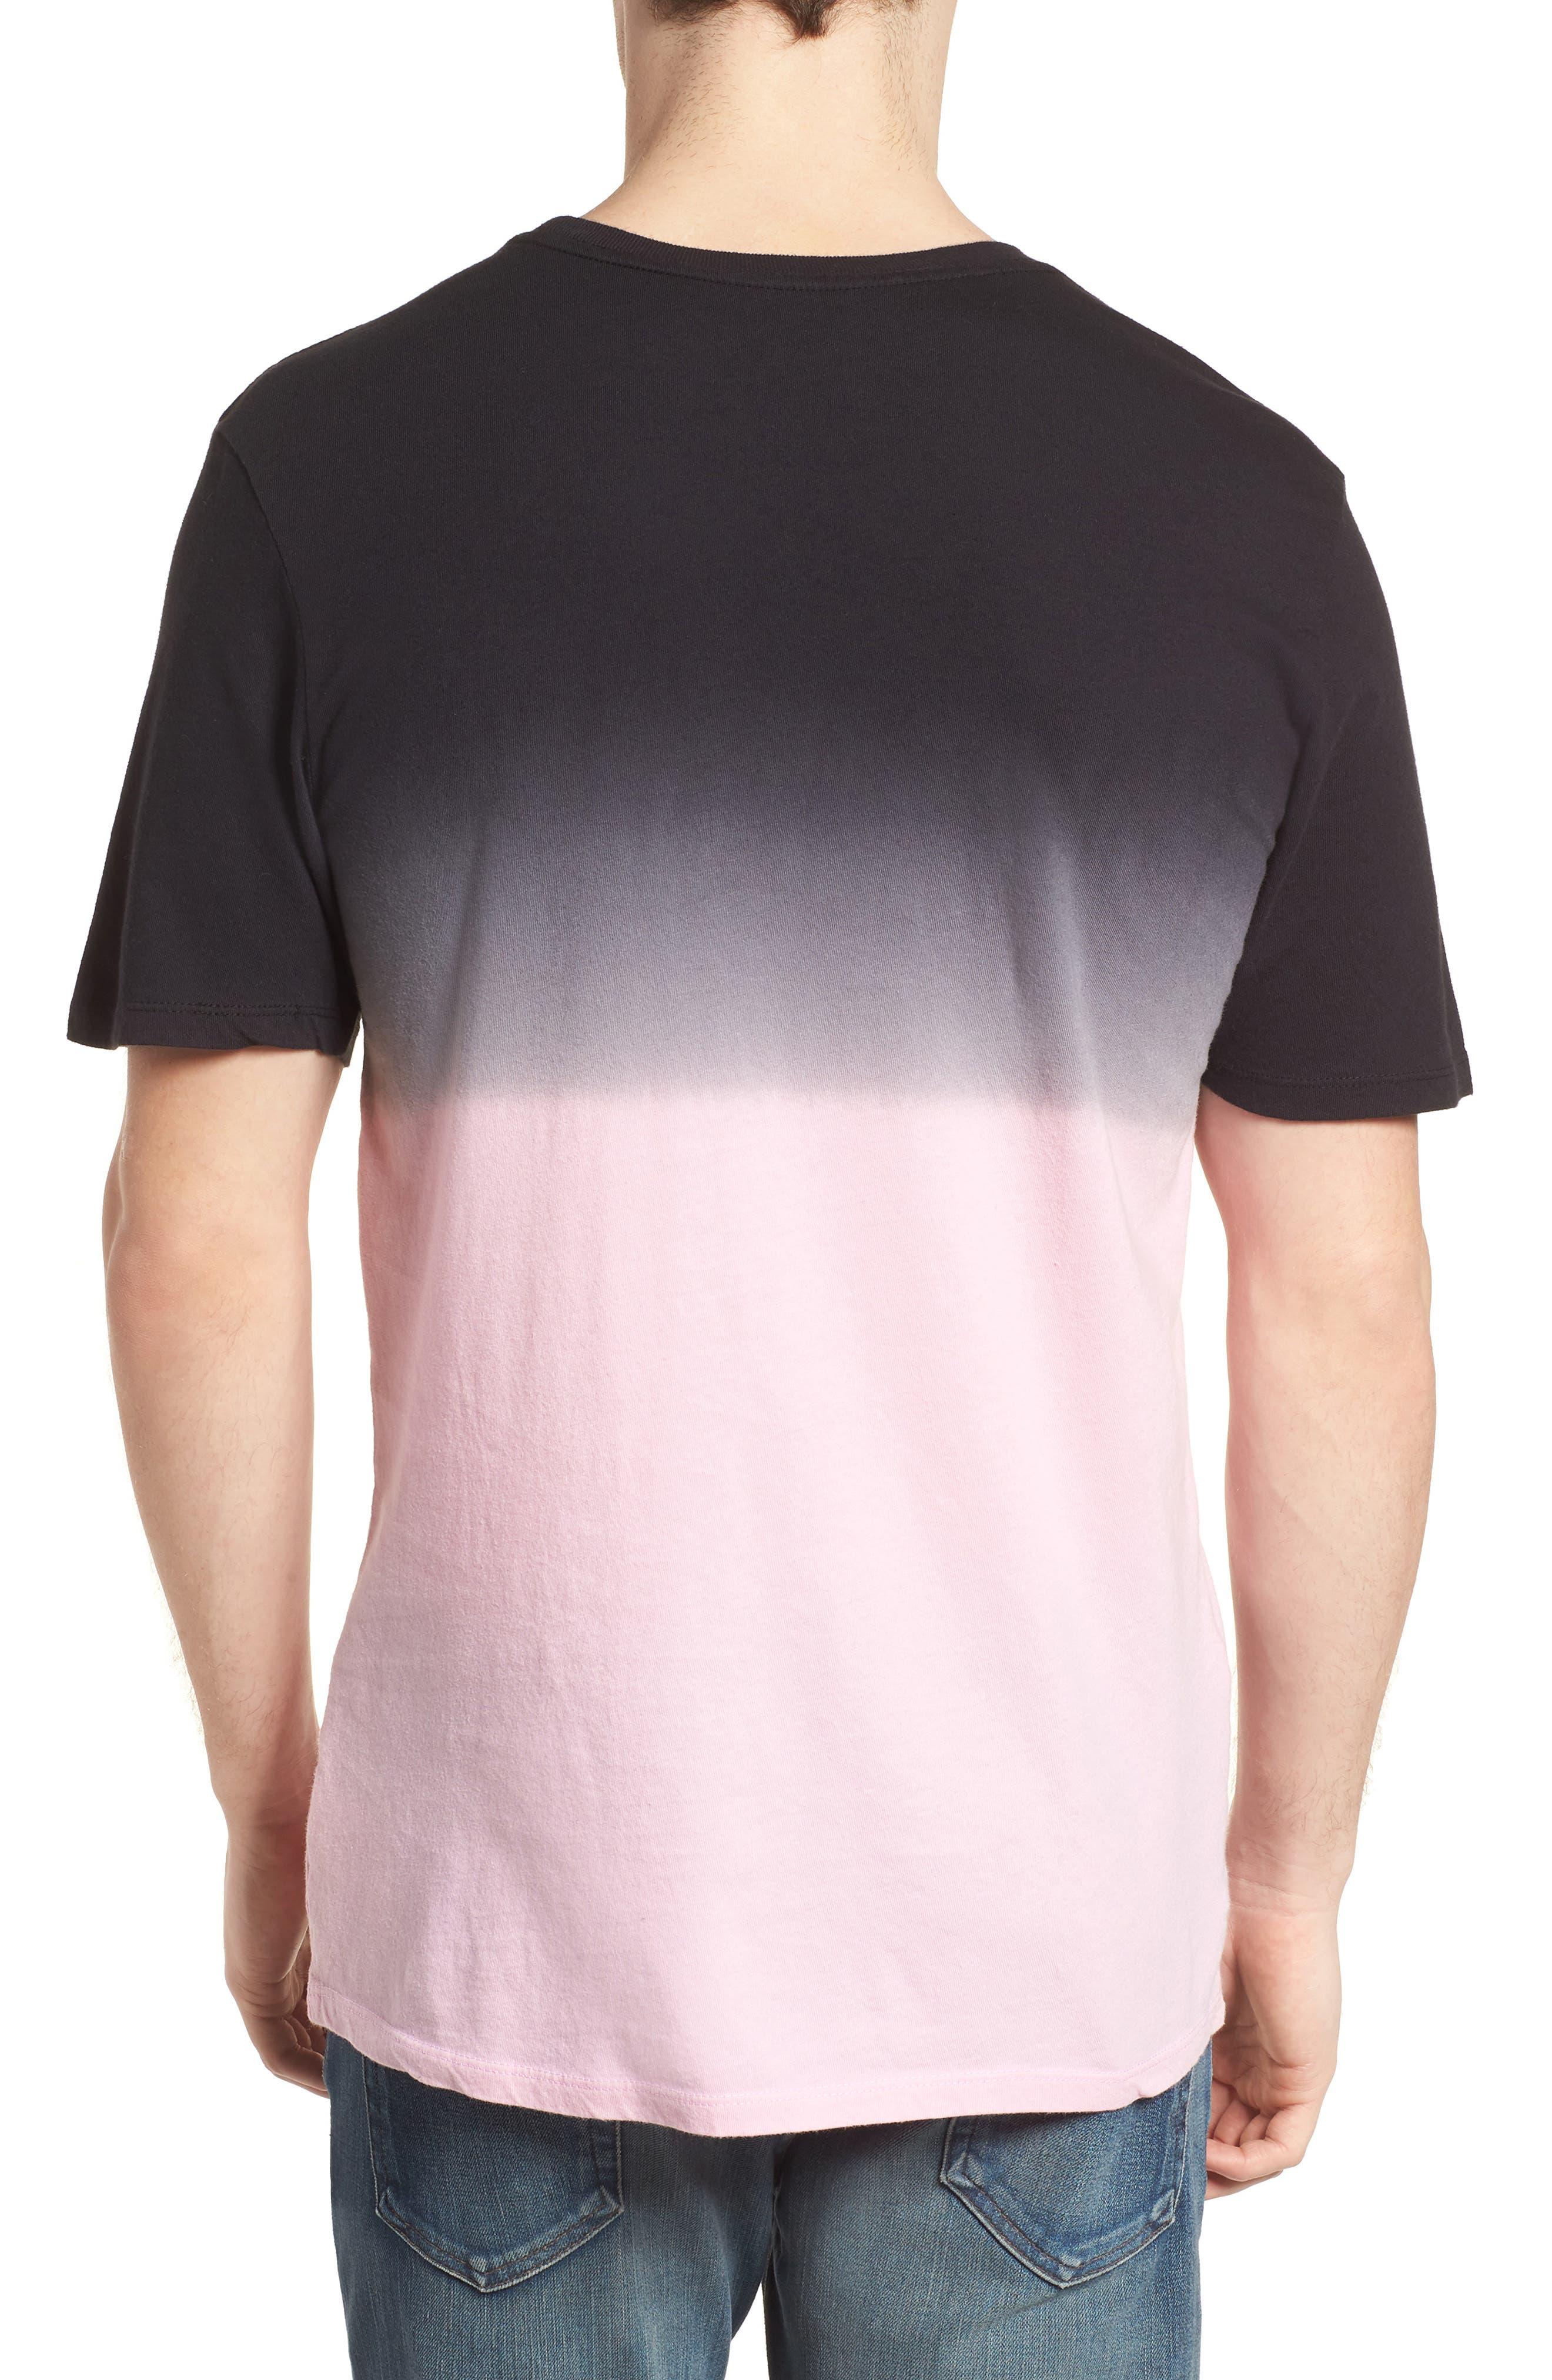 Trajectory Dip Dye T-Shirt,                             Alternate thumbnail 2, color,                             Hyper Pink/Black